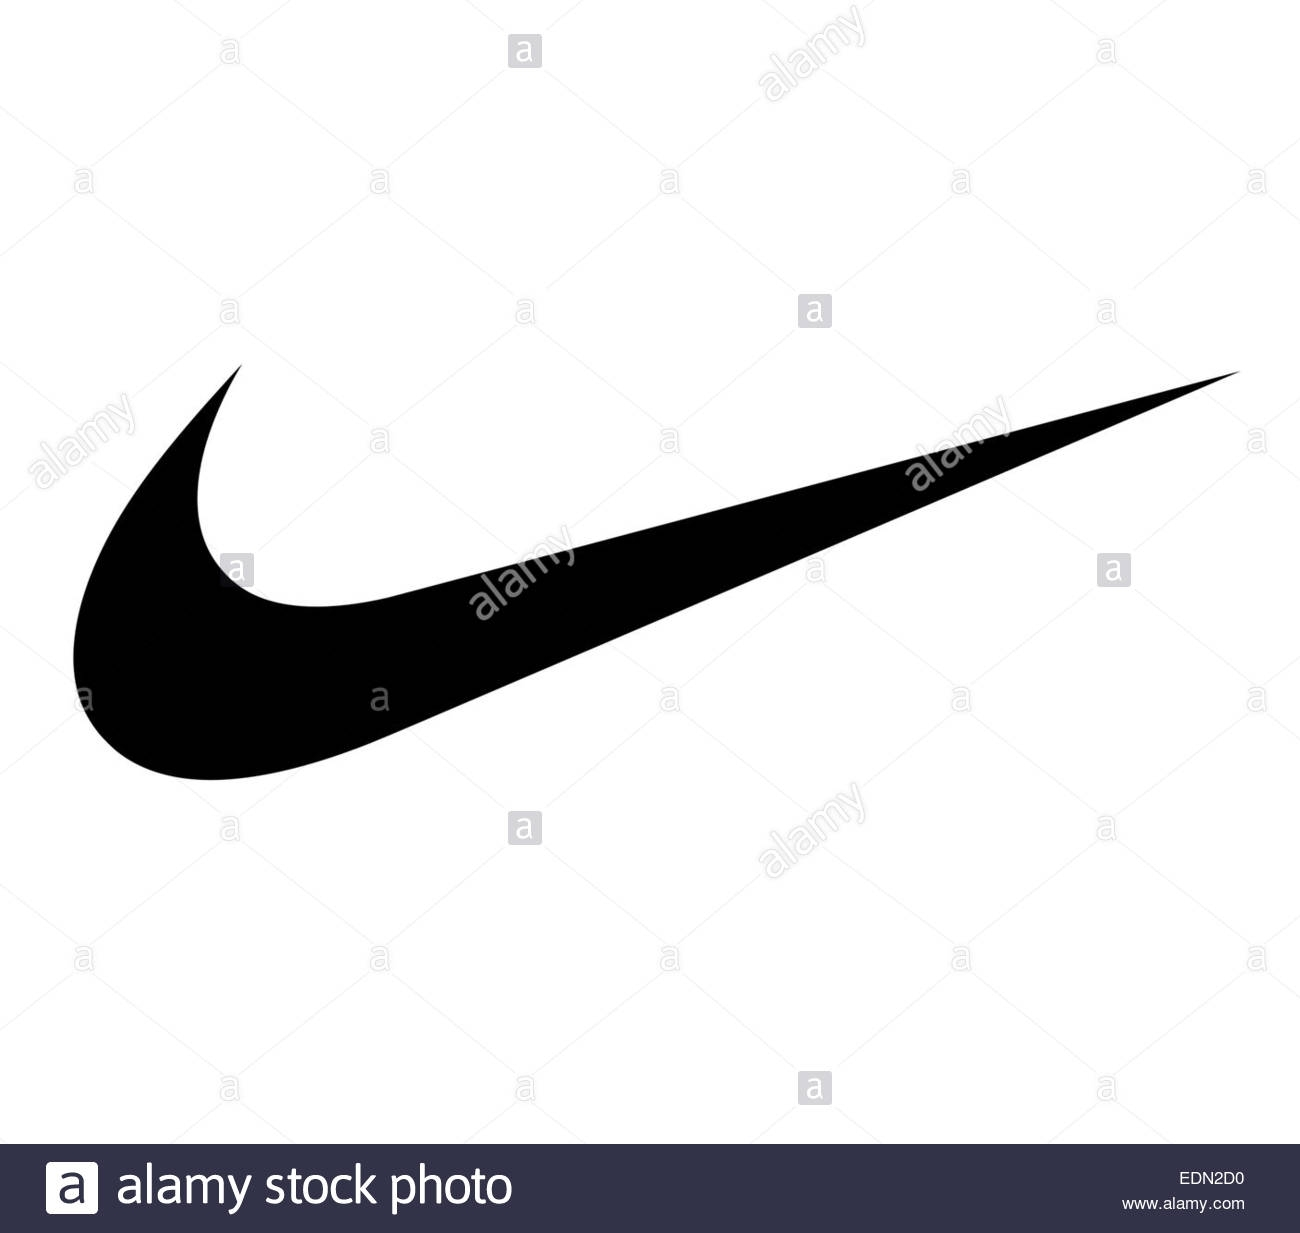 logo nike signe icône banque d'images, photo stock: 77294924 - alamy